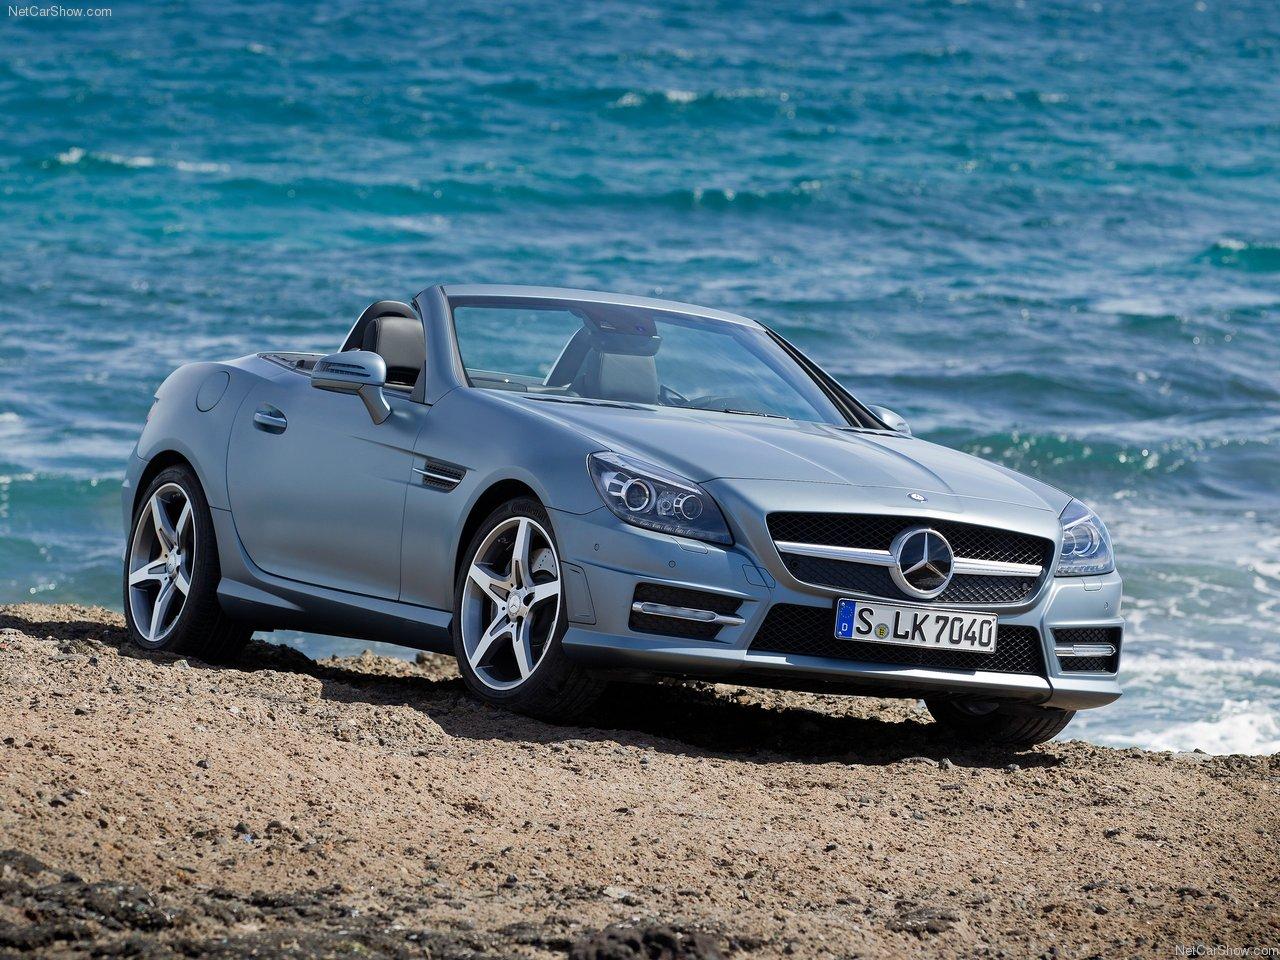 http://2.bp.blogspot.com/-XH7fwCZgmVs/TZxhnxV8JEI/AAAAAAACMdw/uBqAzfmaVJc/s1600/Mercedes-Benz-SLK350_2012_1280x960_wallpaper_02.jpg